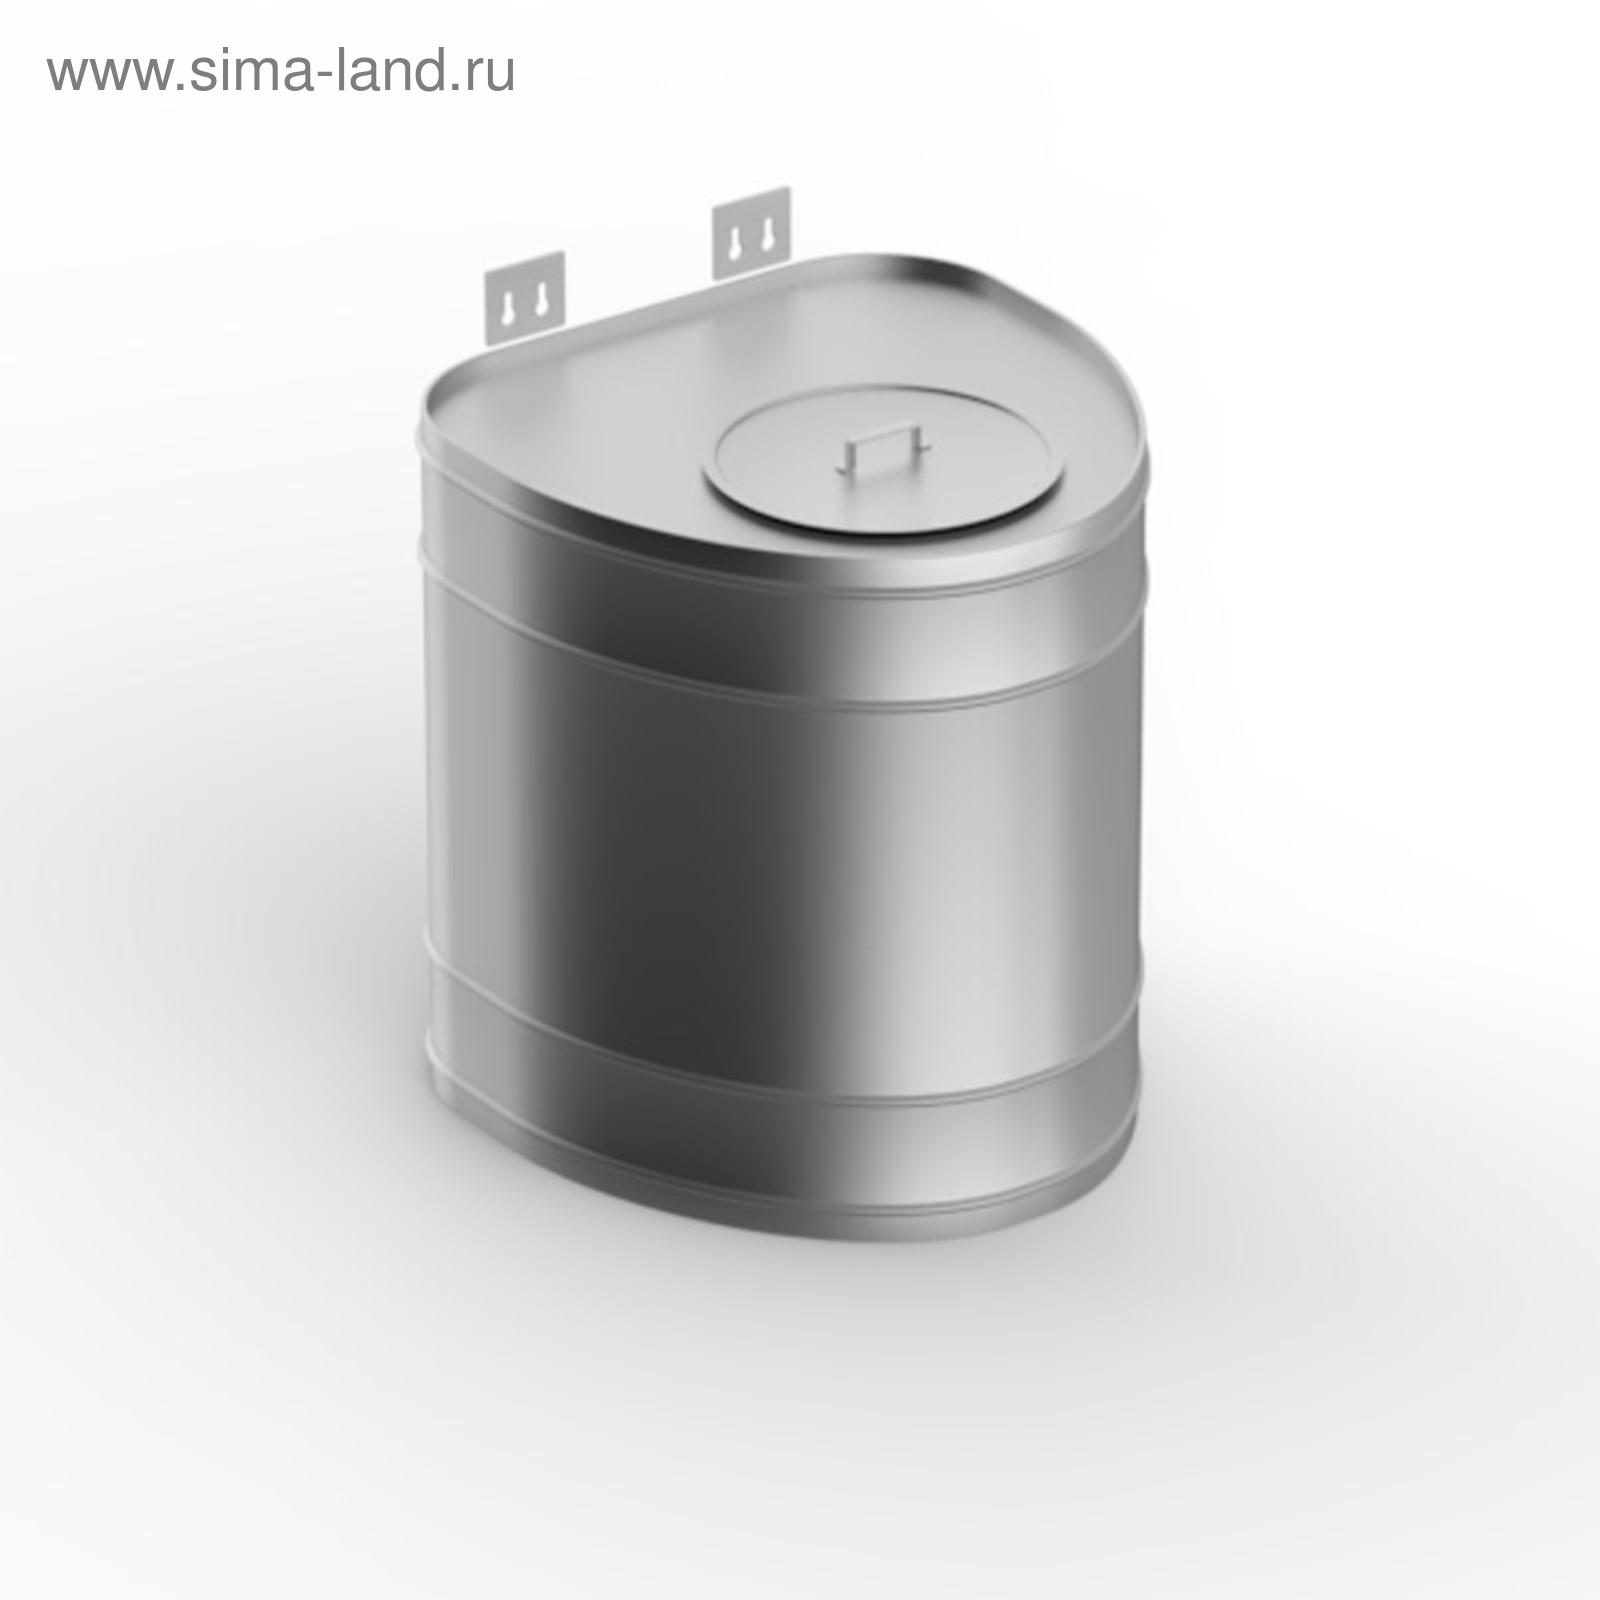 Теплообменник 100 л Бустер для промывки теплообменников Cillit SEK 28 Сургут